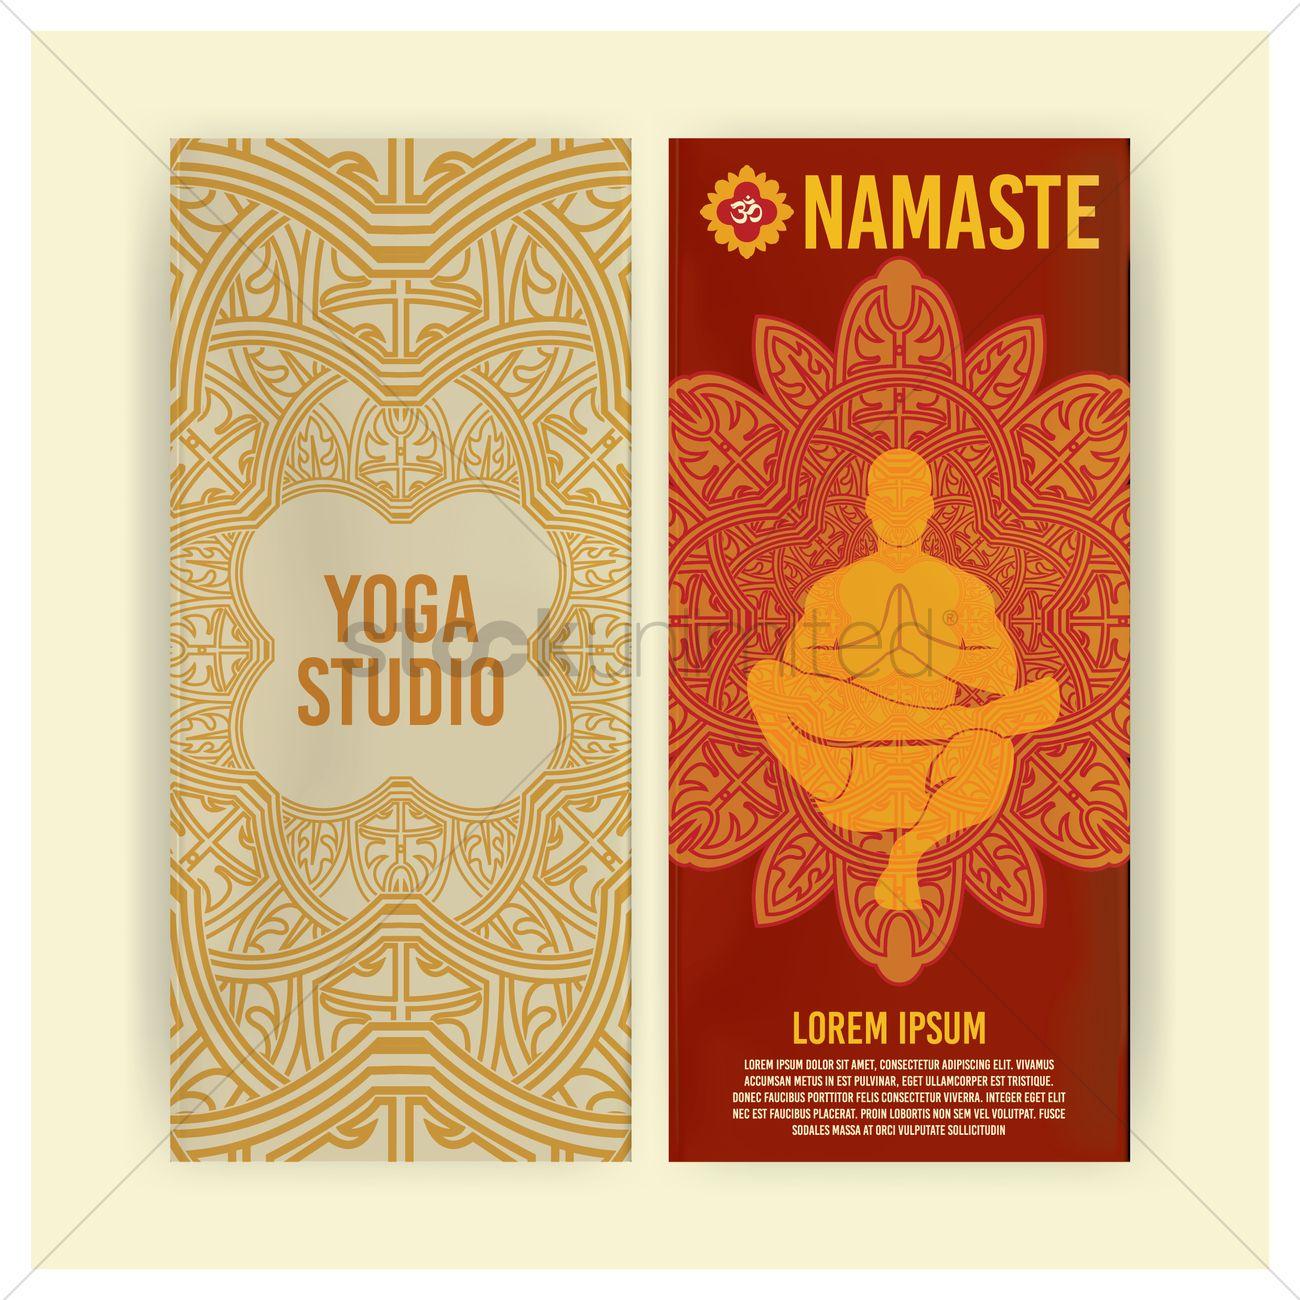 Yoga Brochure Vector Image 1825933 Stockunlimited